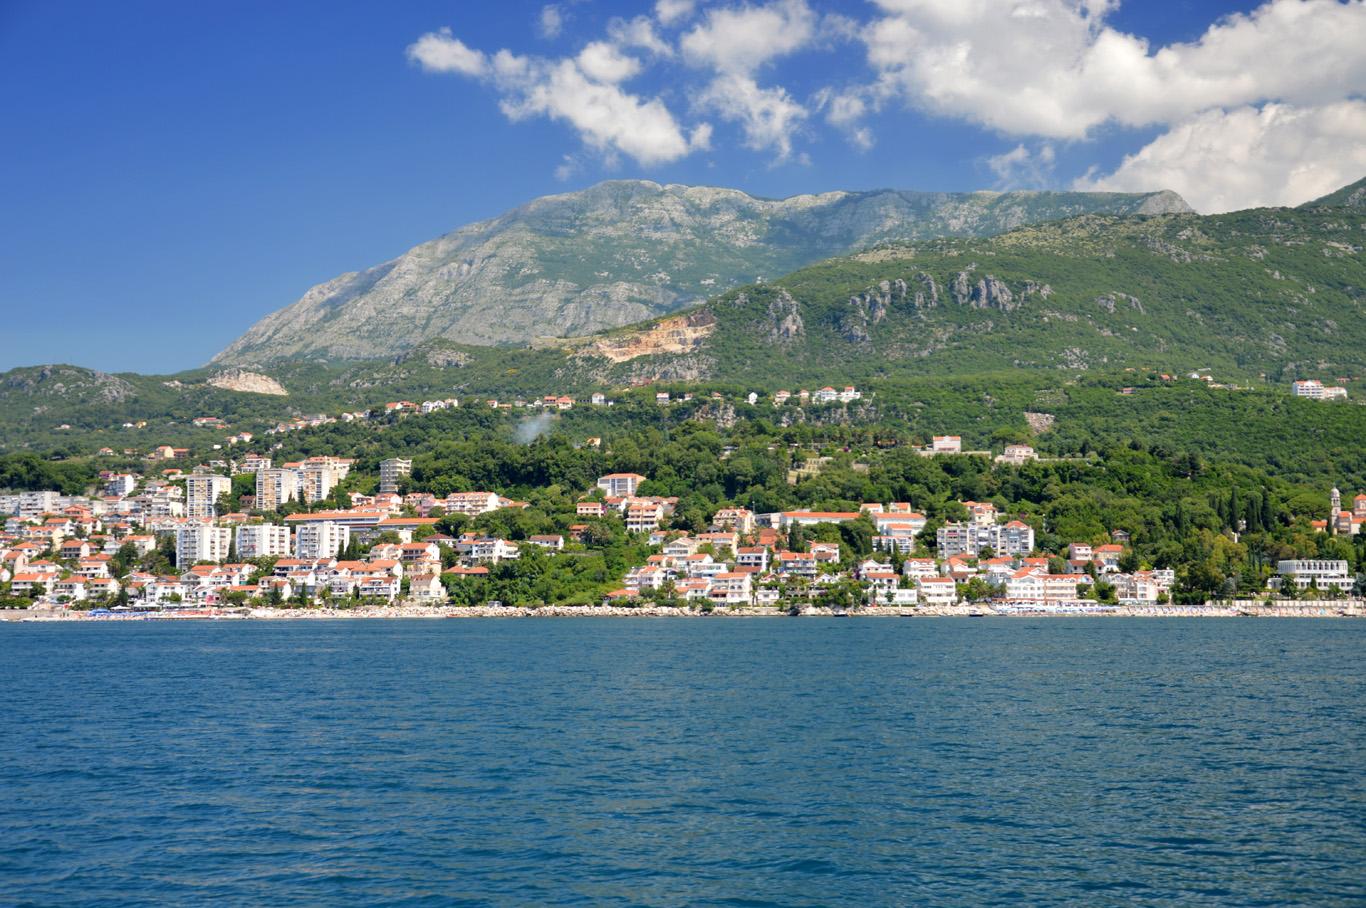 Herceg Novi and the Orjen mountain